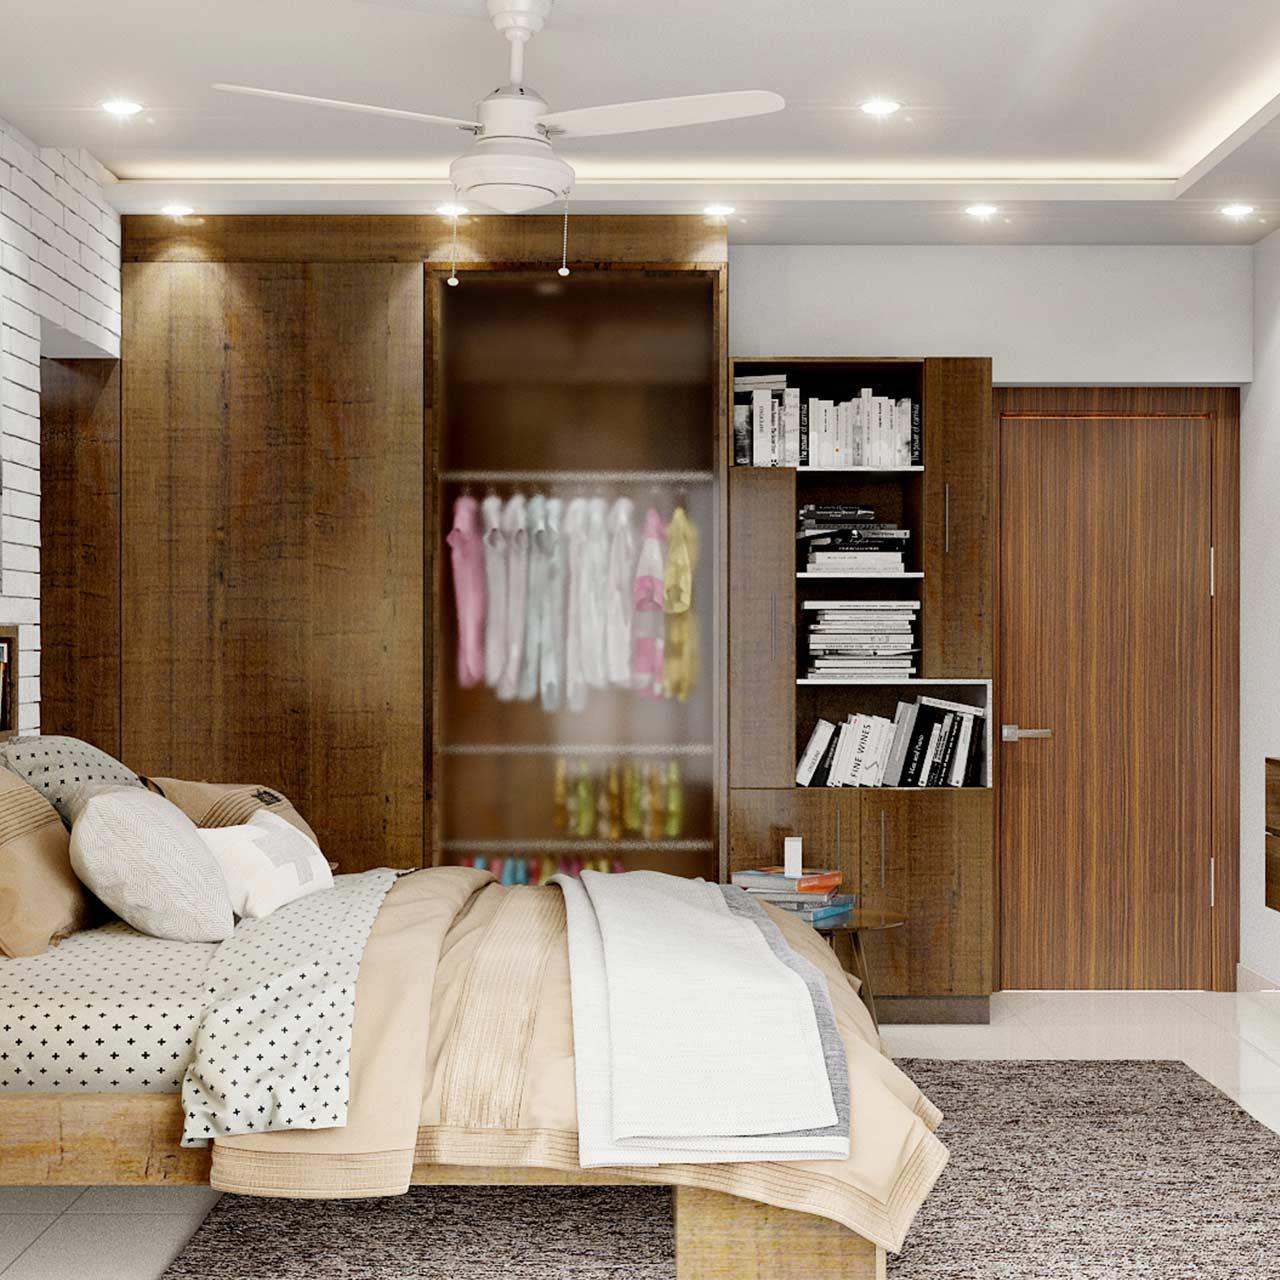 Bedroom designed with bookshelf and wardrobe with transparent glass door